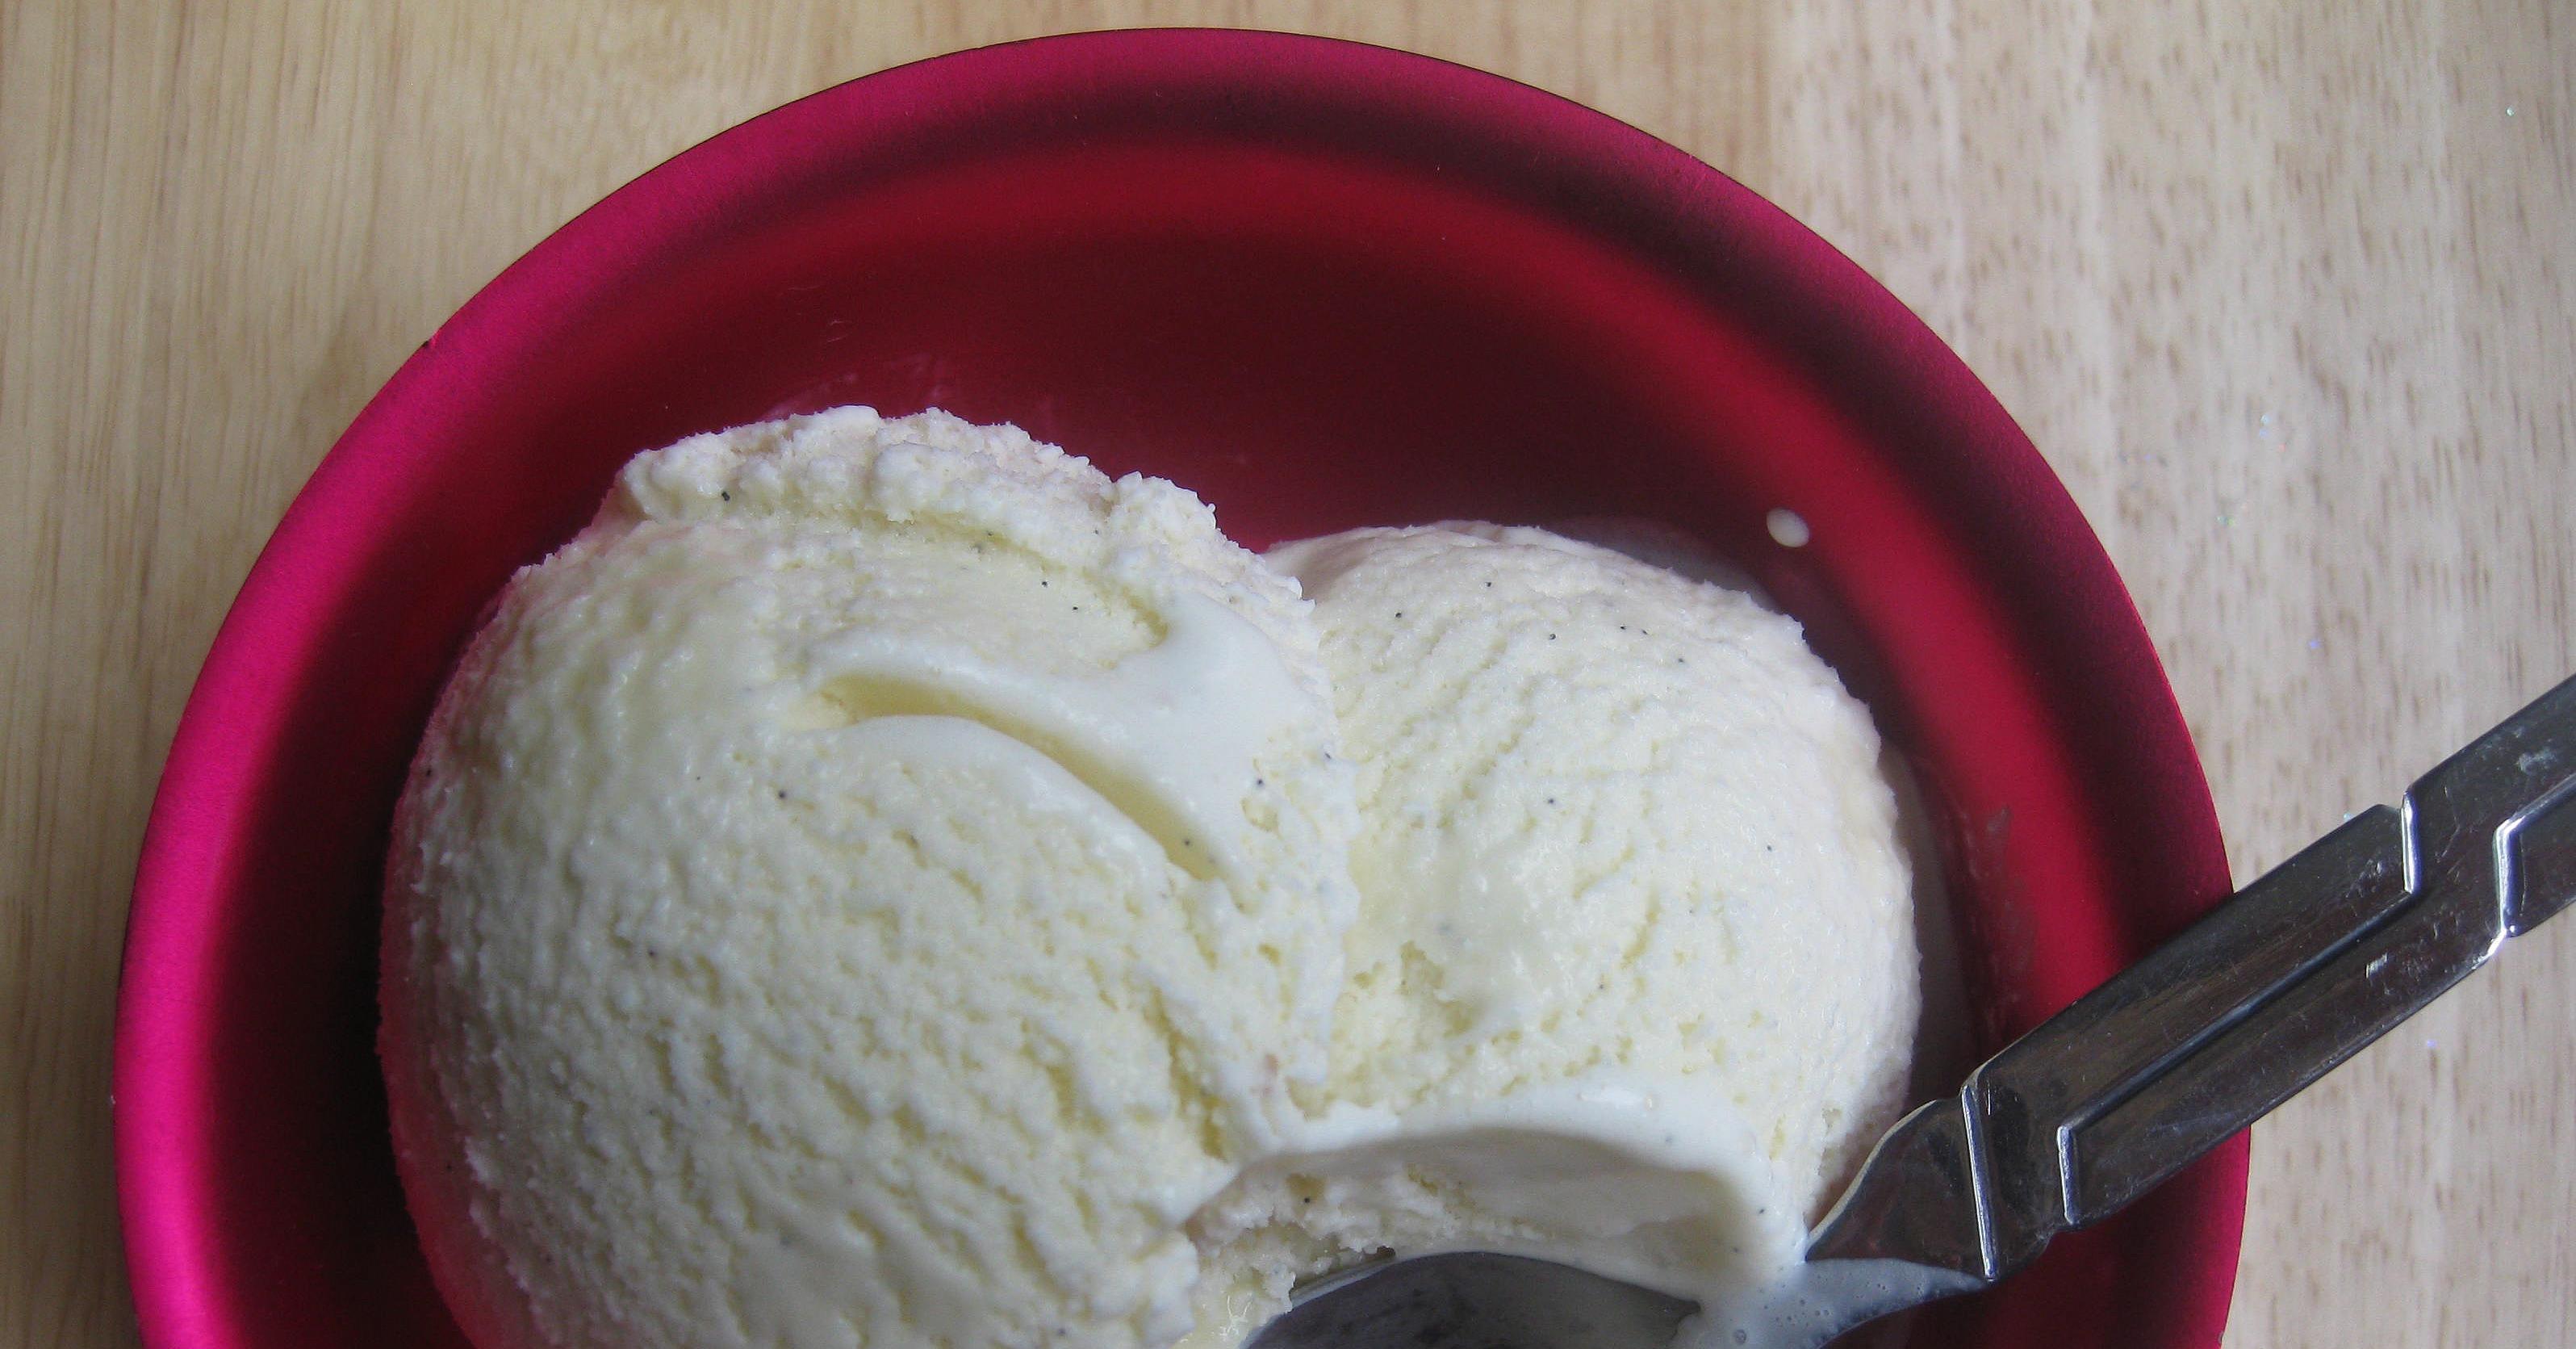 Homemade Vanilla Bean Ice Cream Recipe | POPSUGAR Food